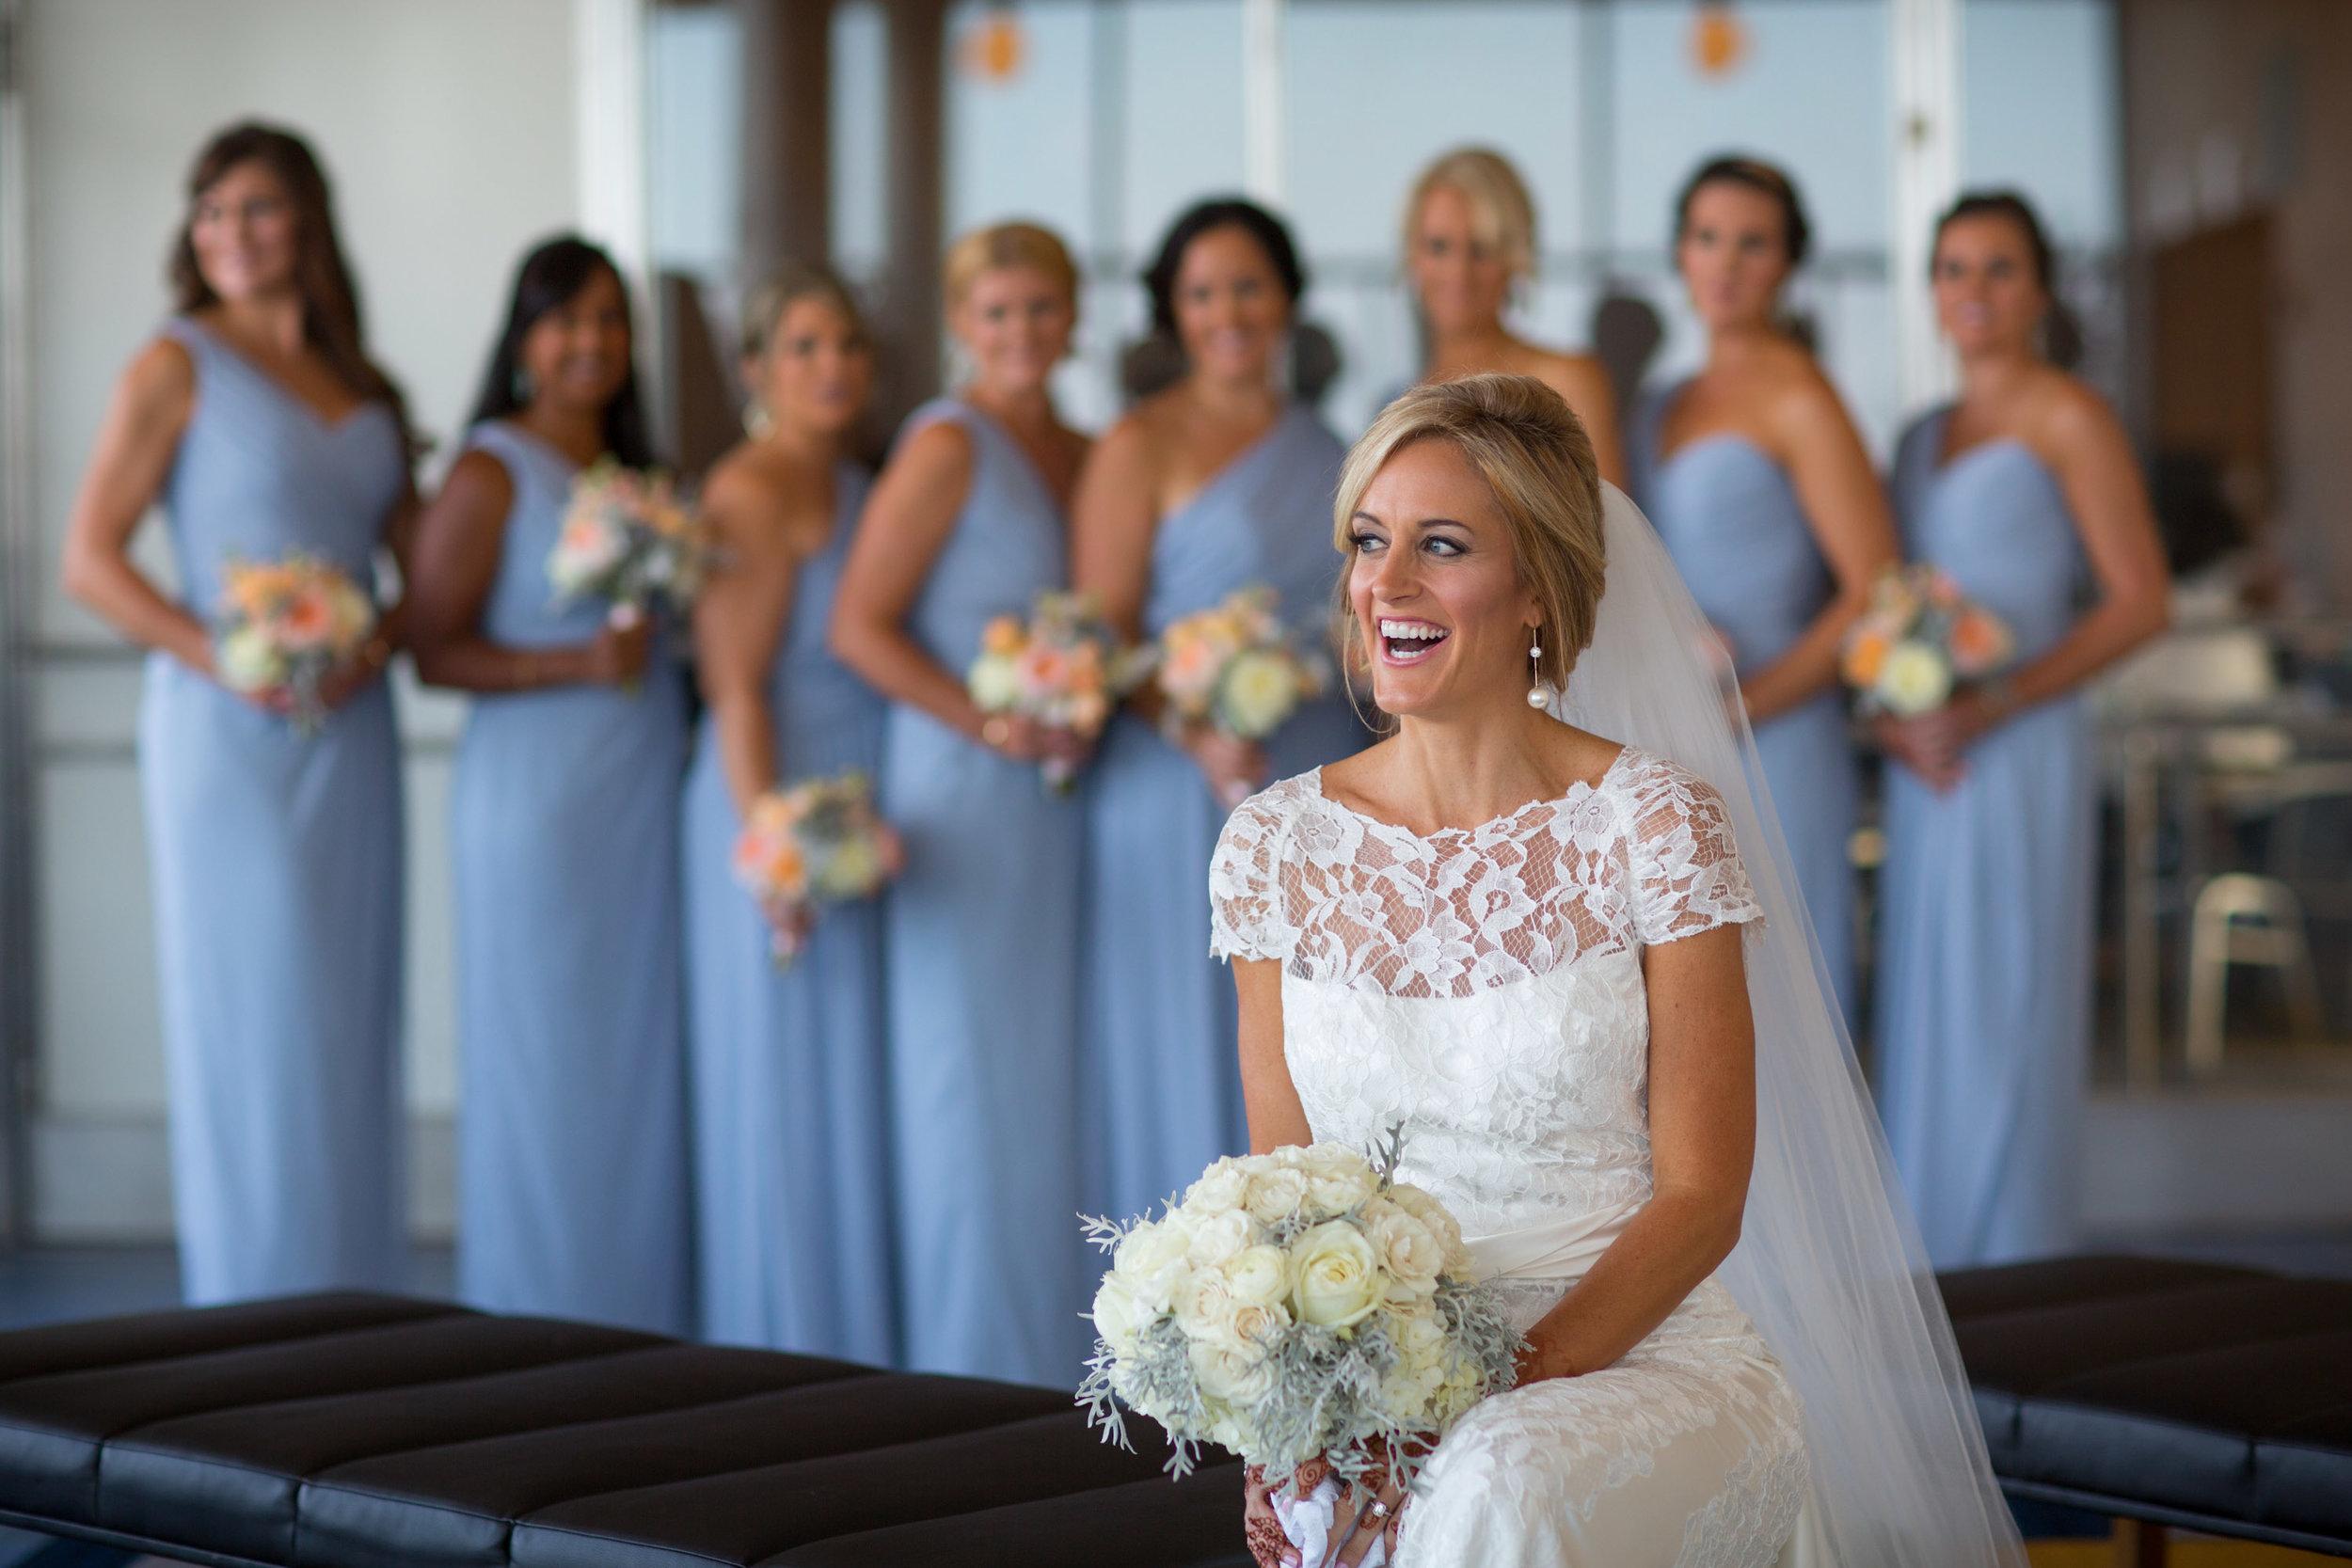 Brooke-Sharat-Wedding-458.jpg